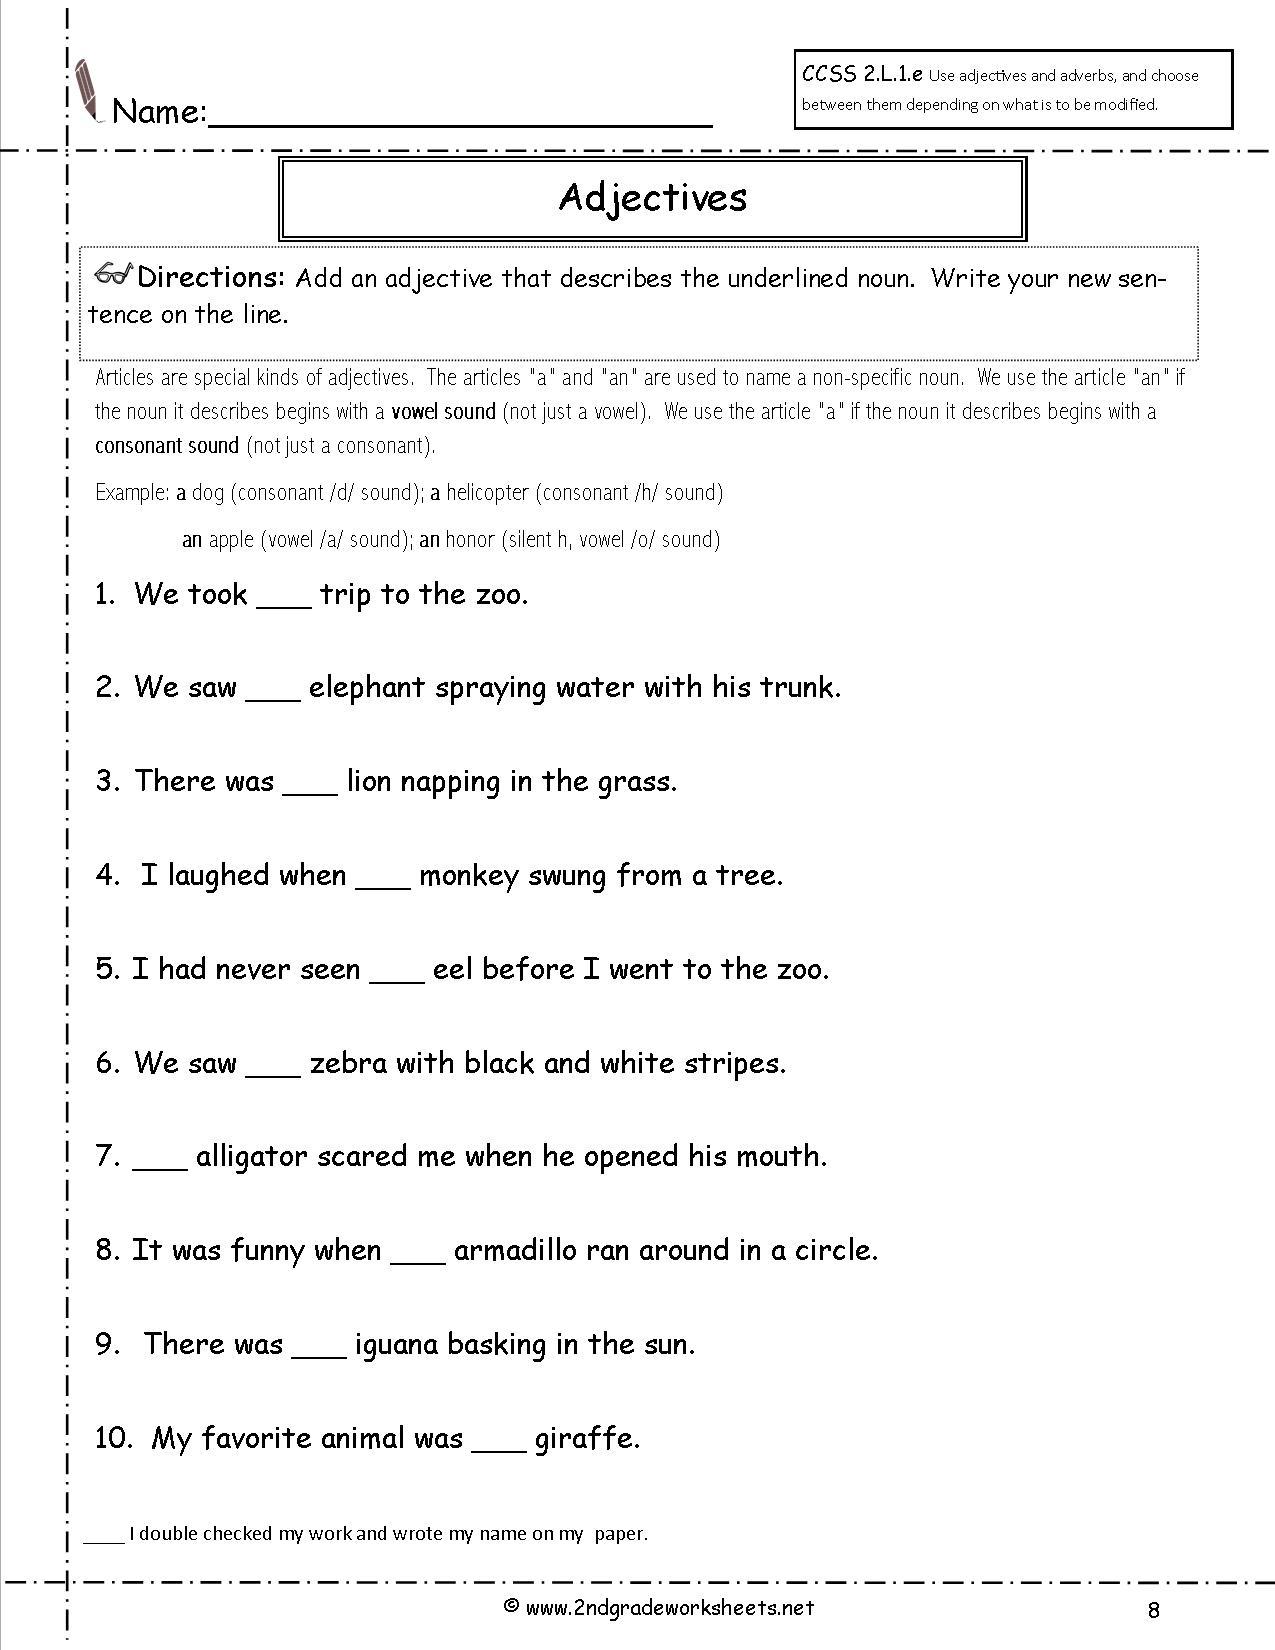 Free Language/grammar Worksheets And Printouts | 2Nd Grade Grammar Printable Worksheets